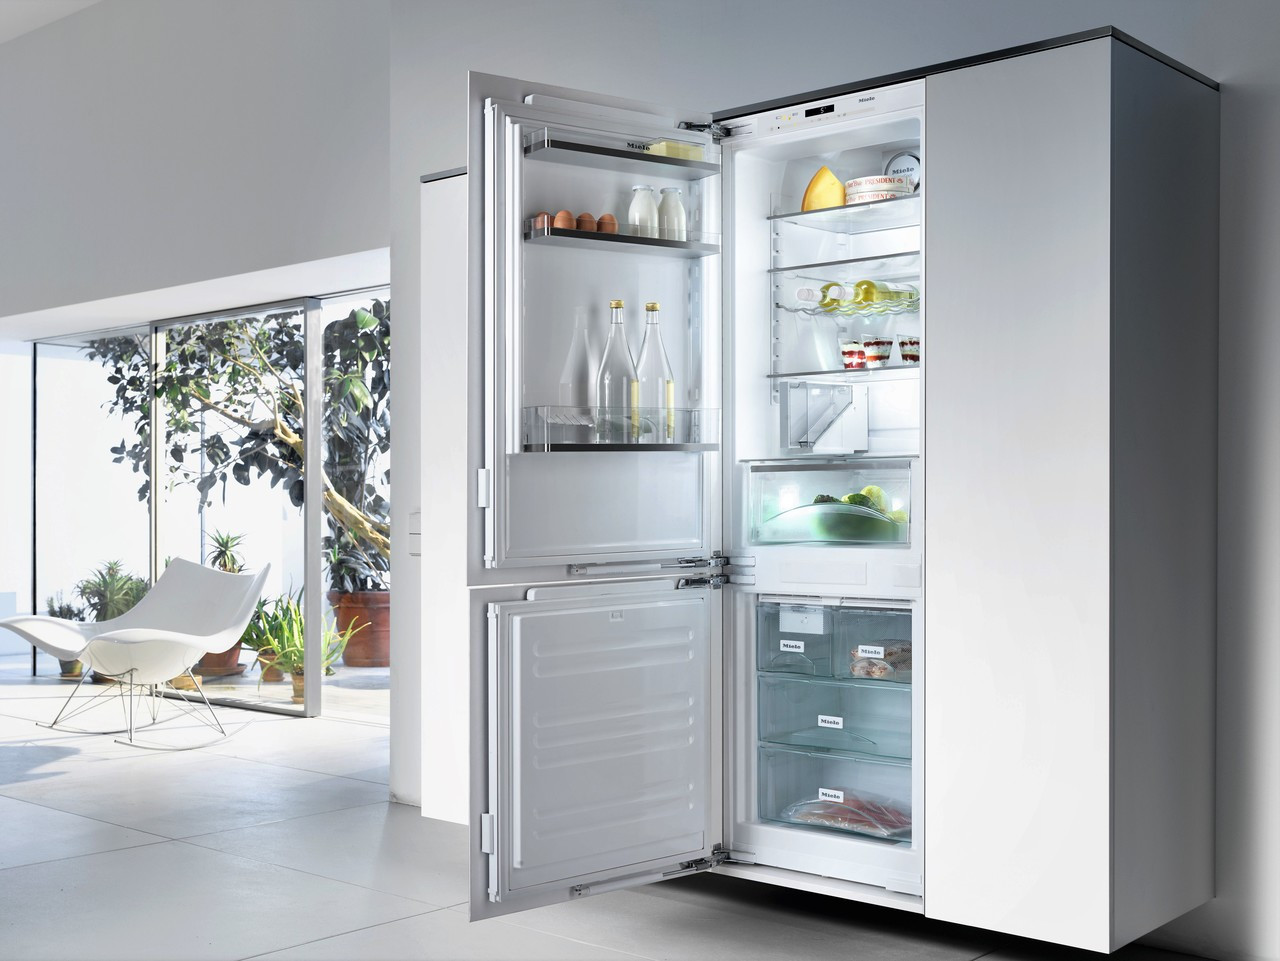 Miele Kfns 37452 Ide Integrated Fridge Freezer Rawsons